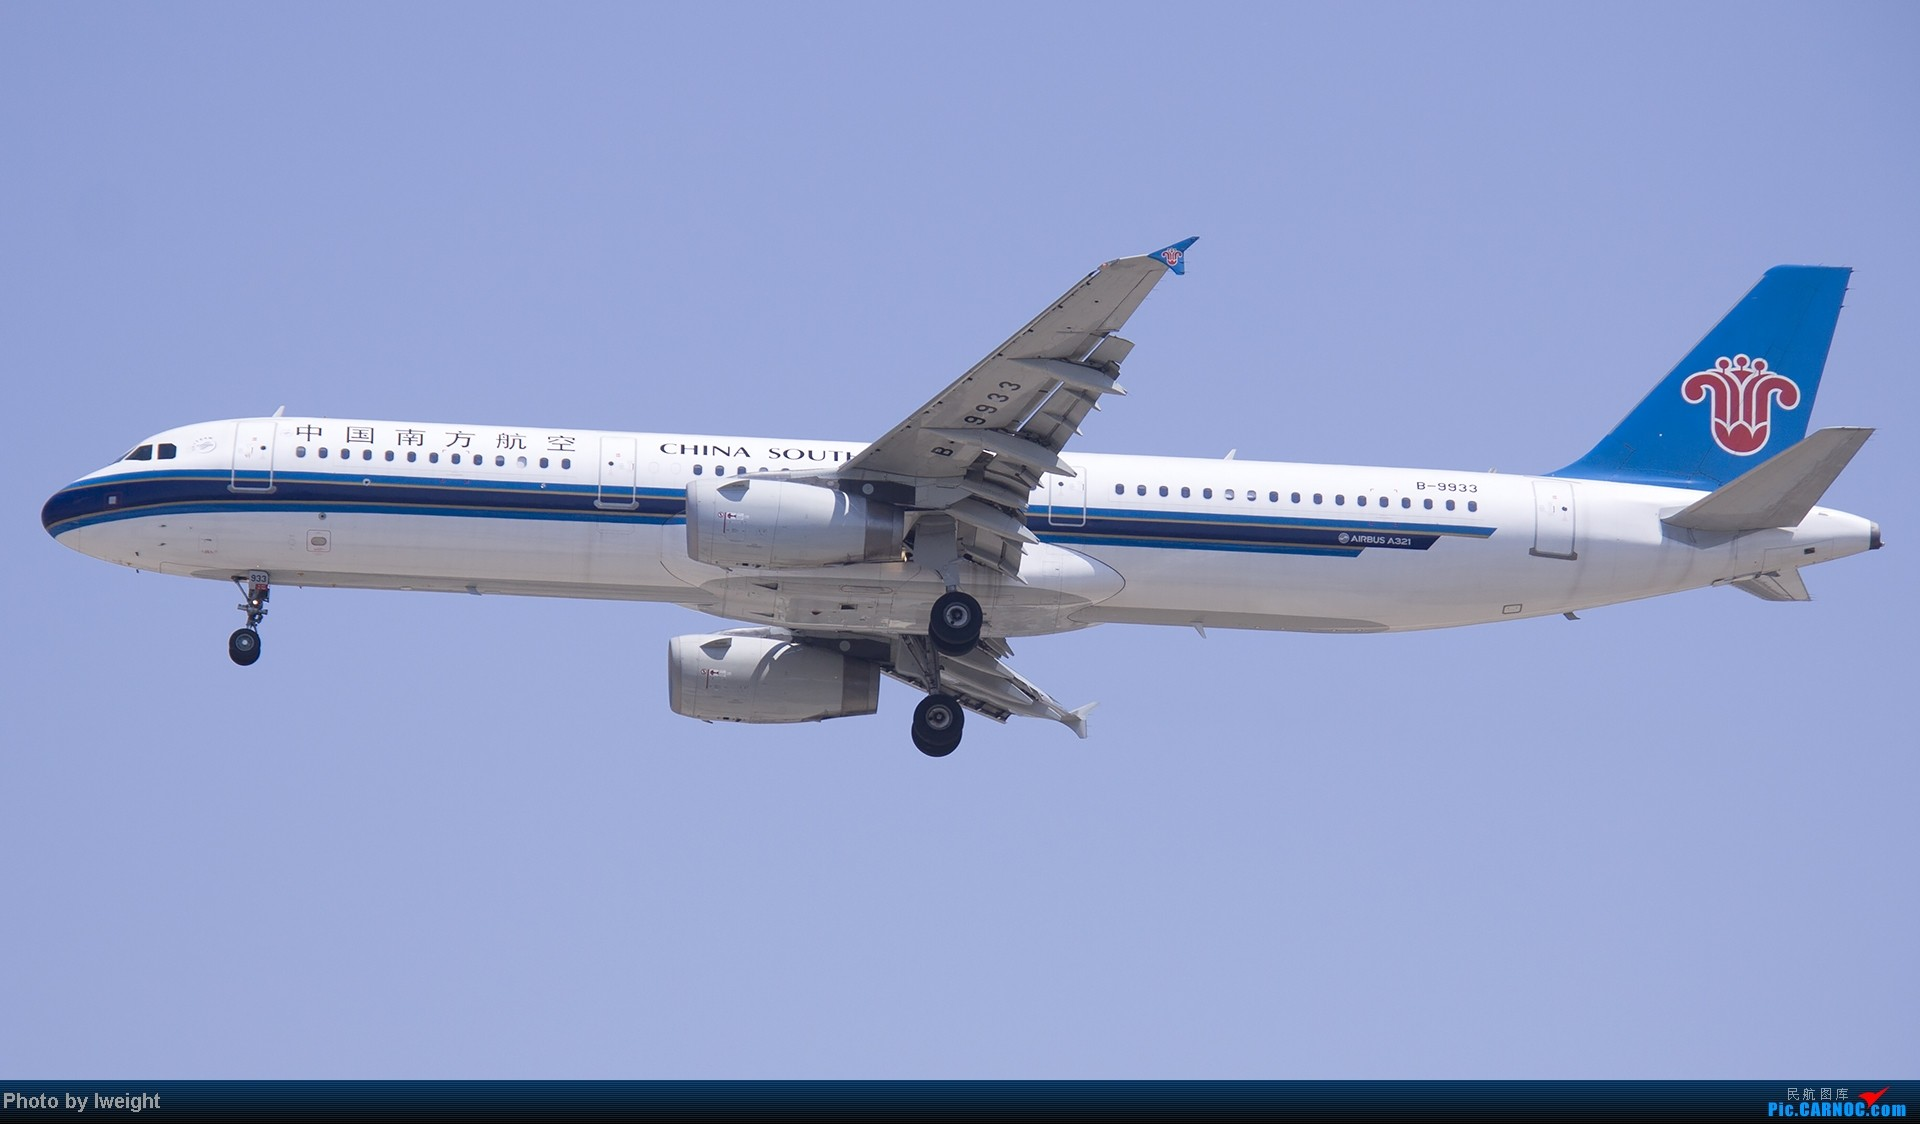 Re:[原创]北京难得的好天气,收获多种机型和彩绘,遗憾的是再次错过卡航巴塞罗那彩绘 AIRBUS A321-200 B-9933 中国北京首都机场